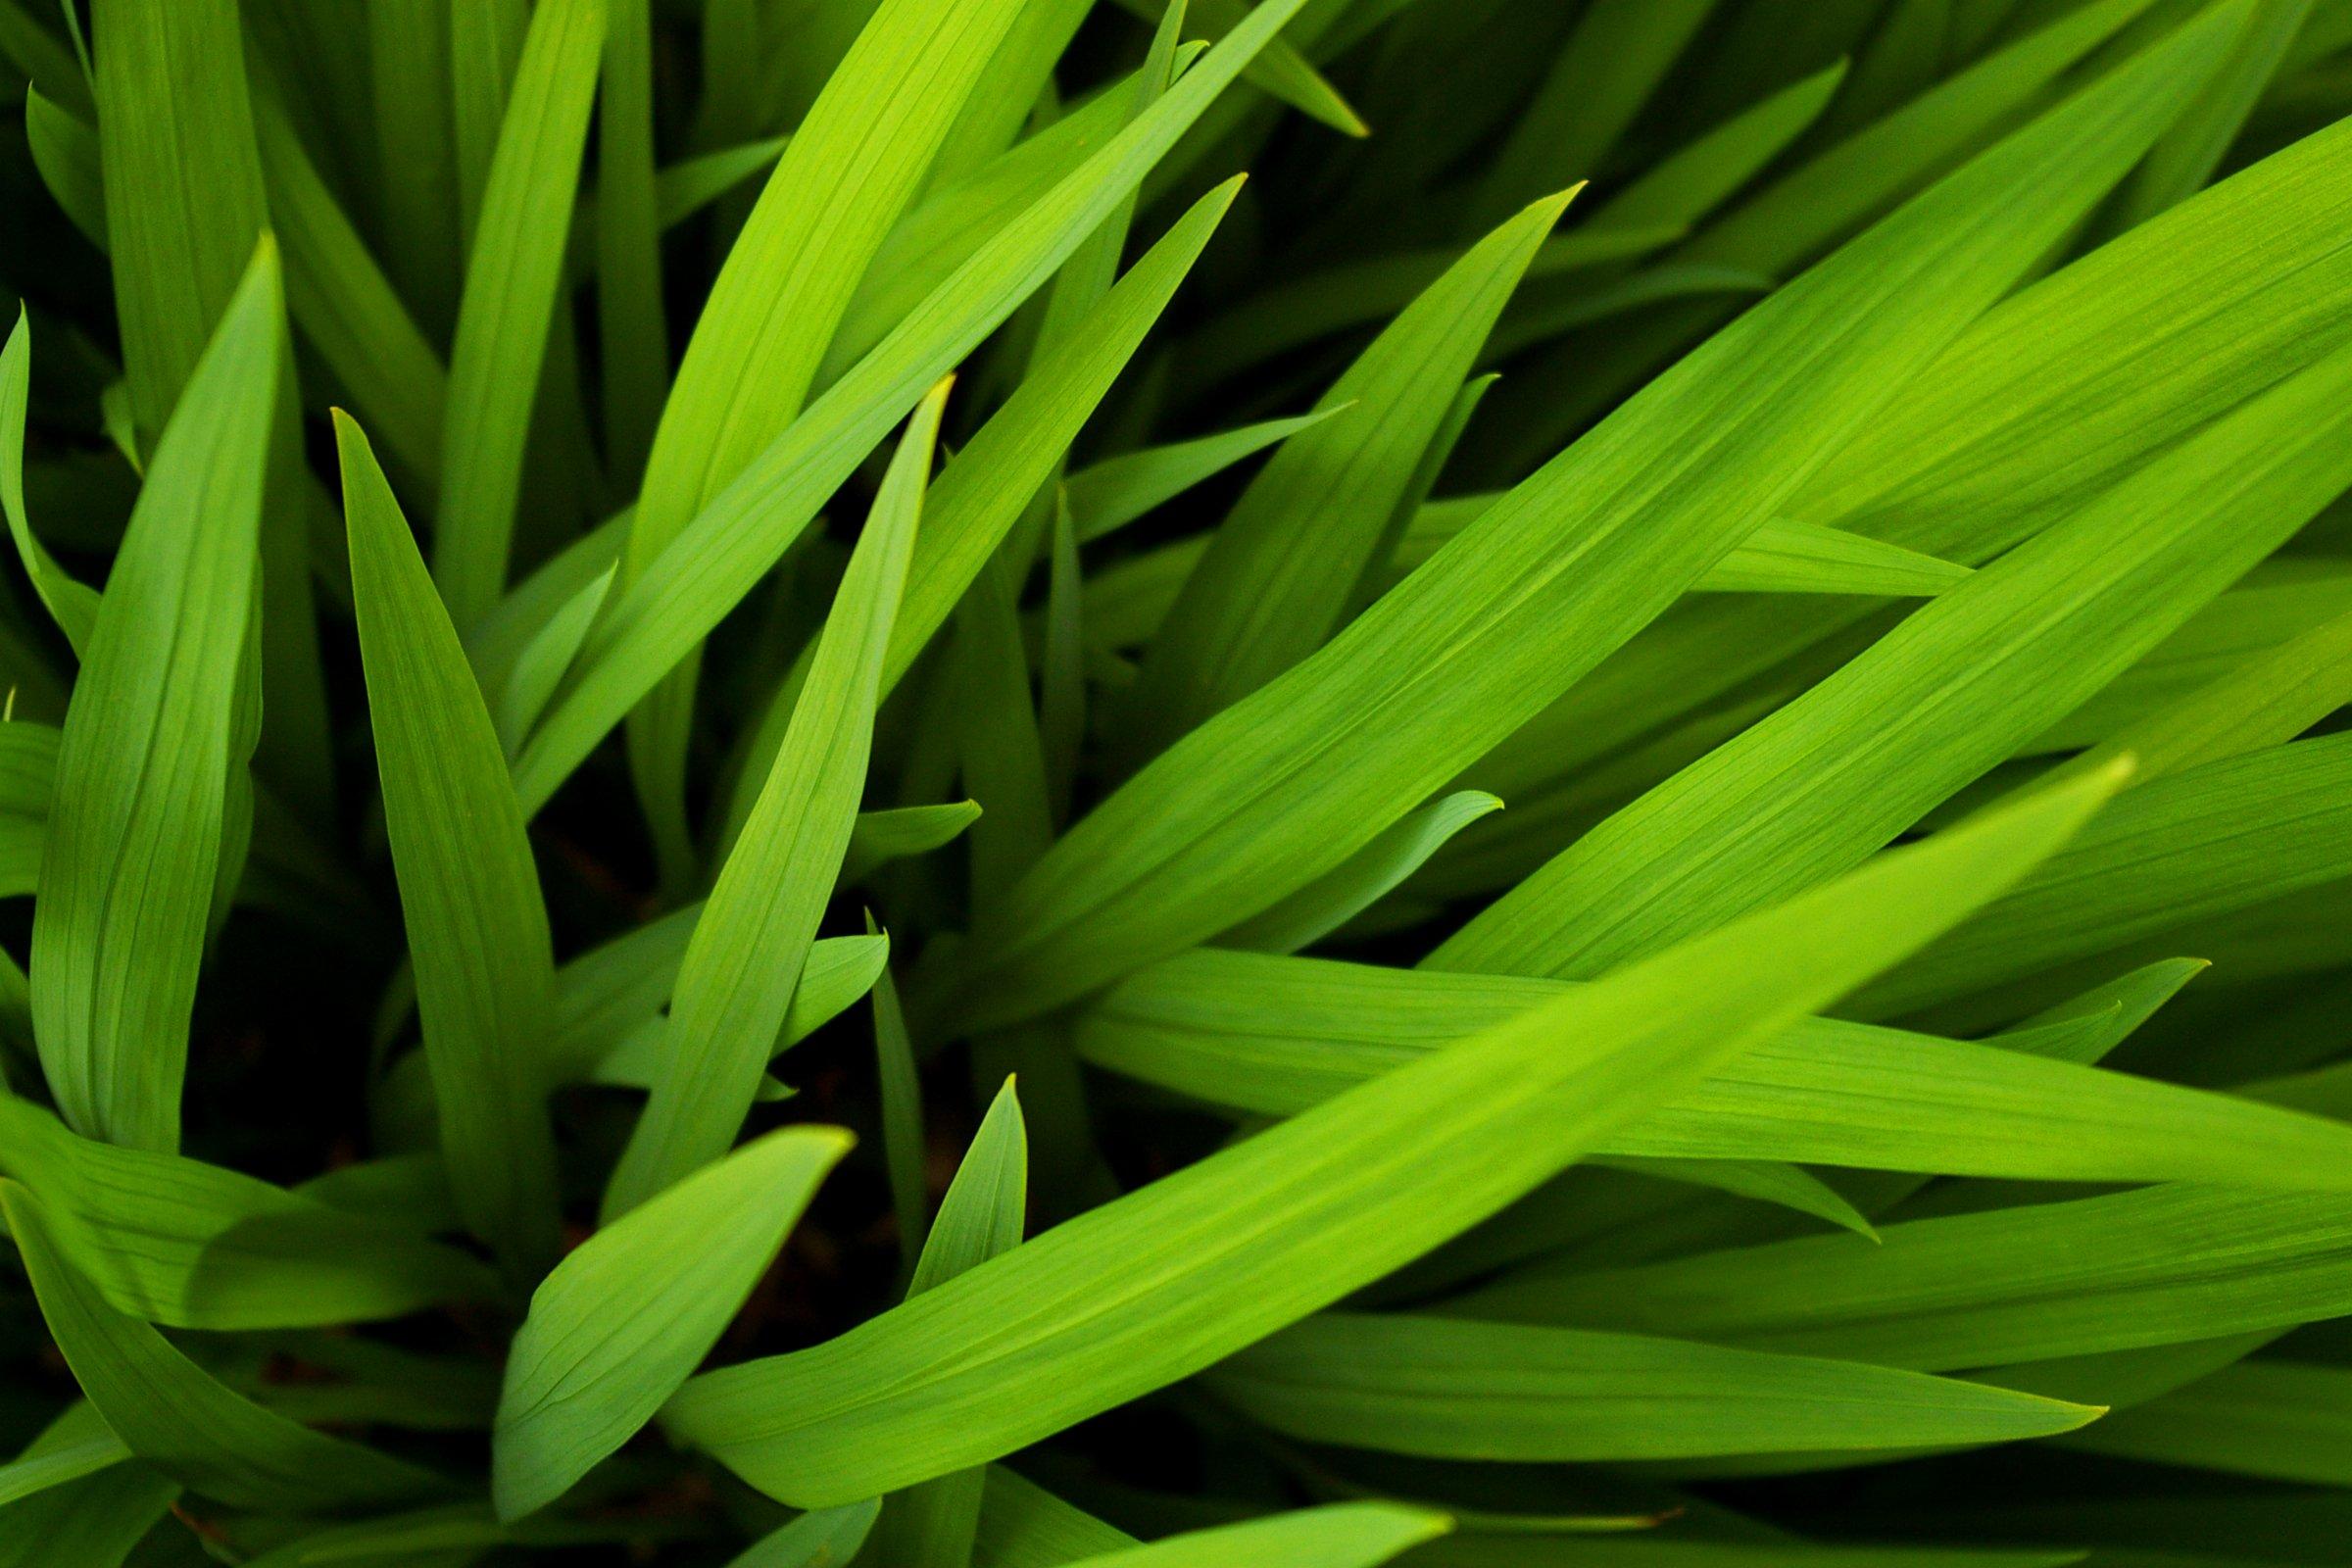 grass-green-irish-fiona-madden-photography